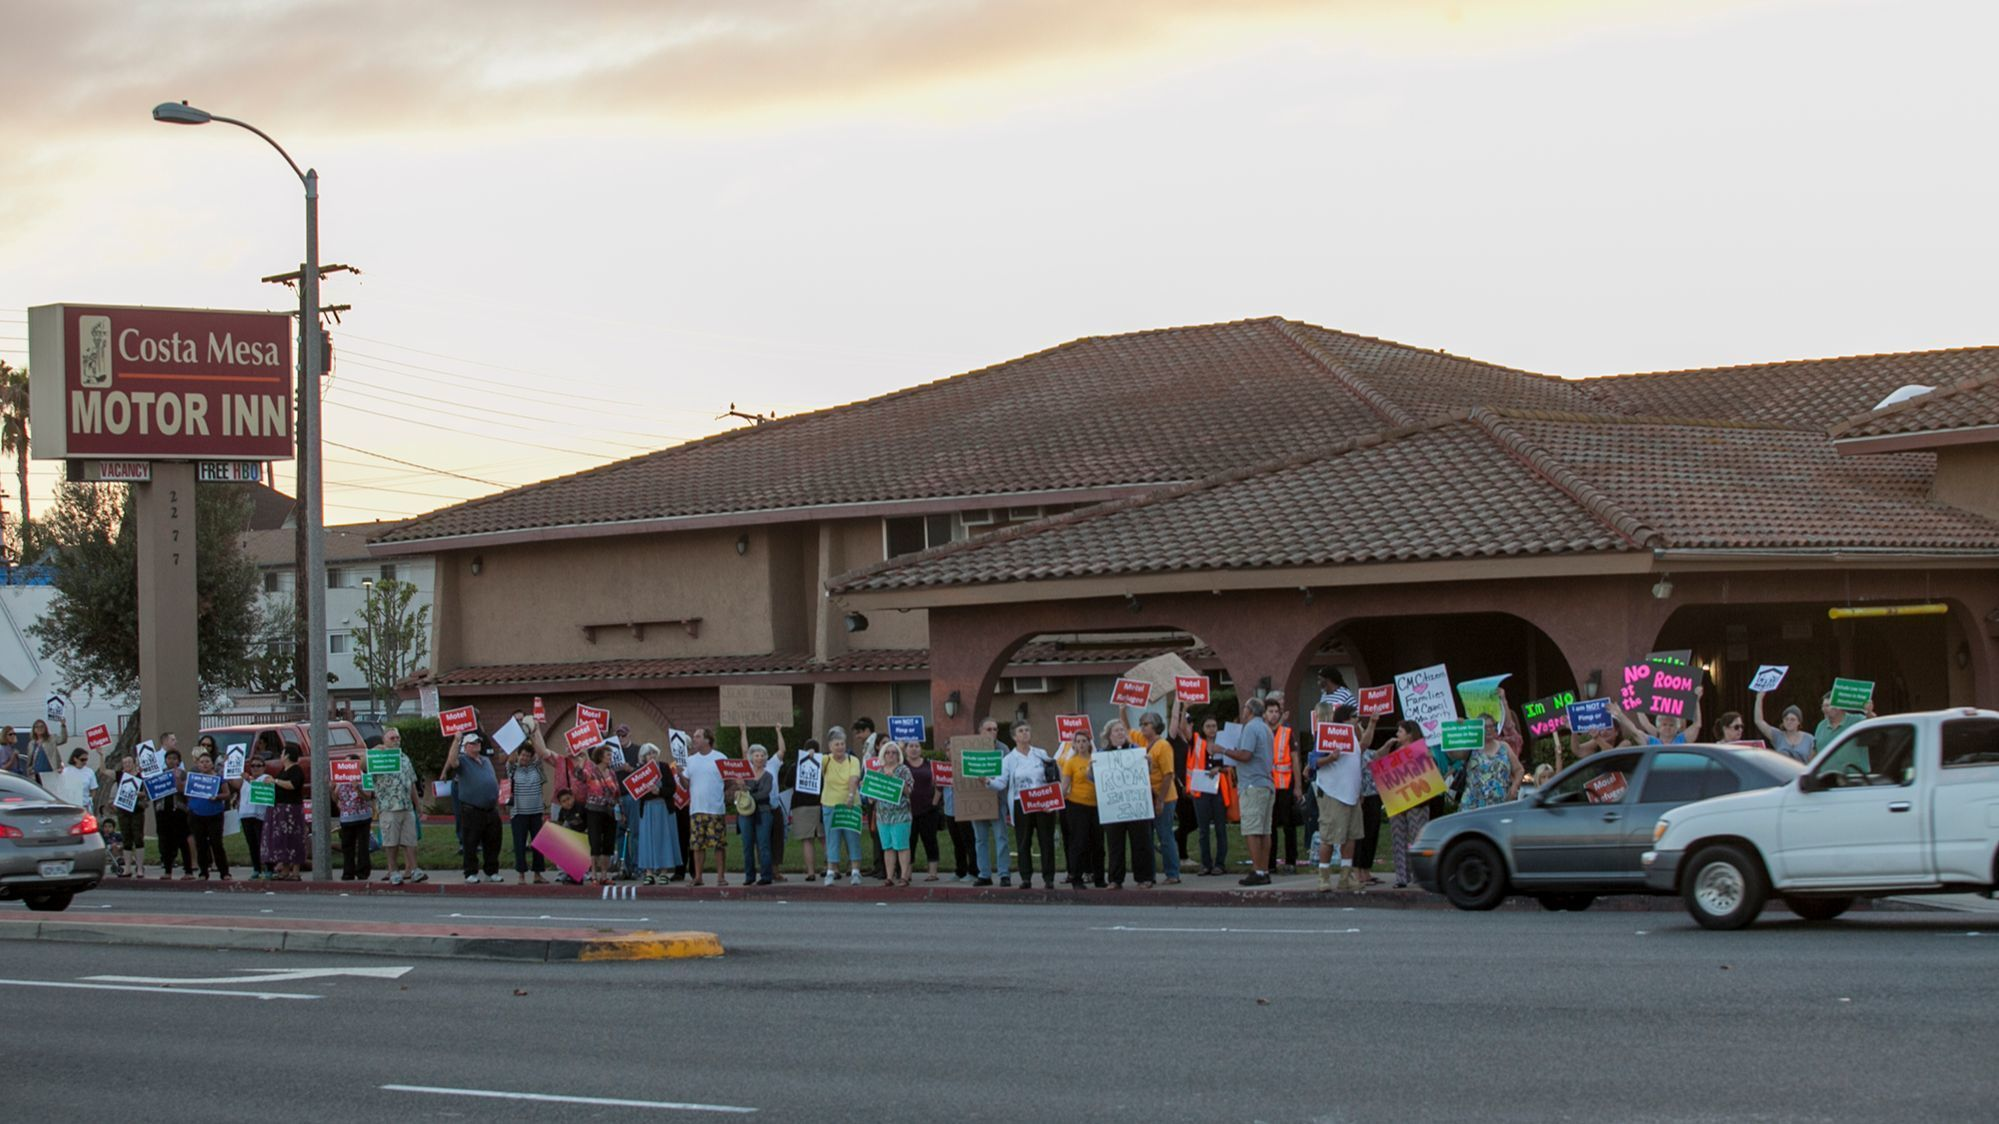 Judge Reverses Costa Mesa 39 S Approval Of Motor Inn